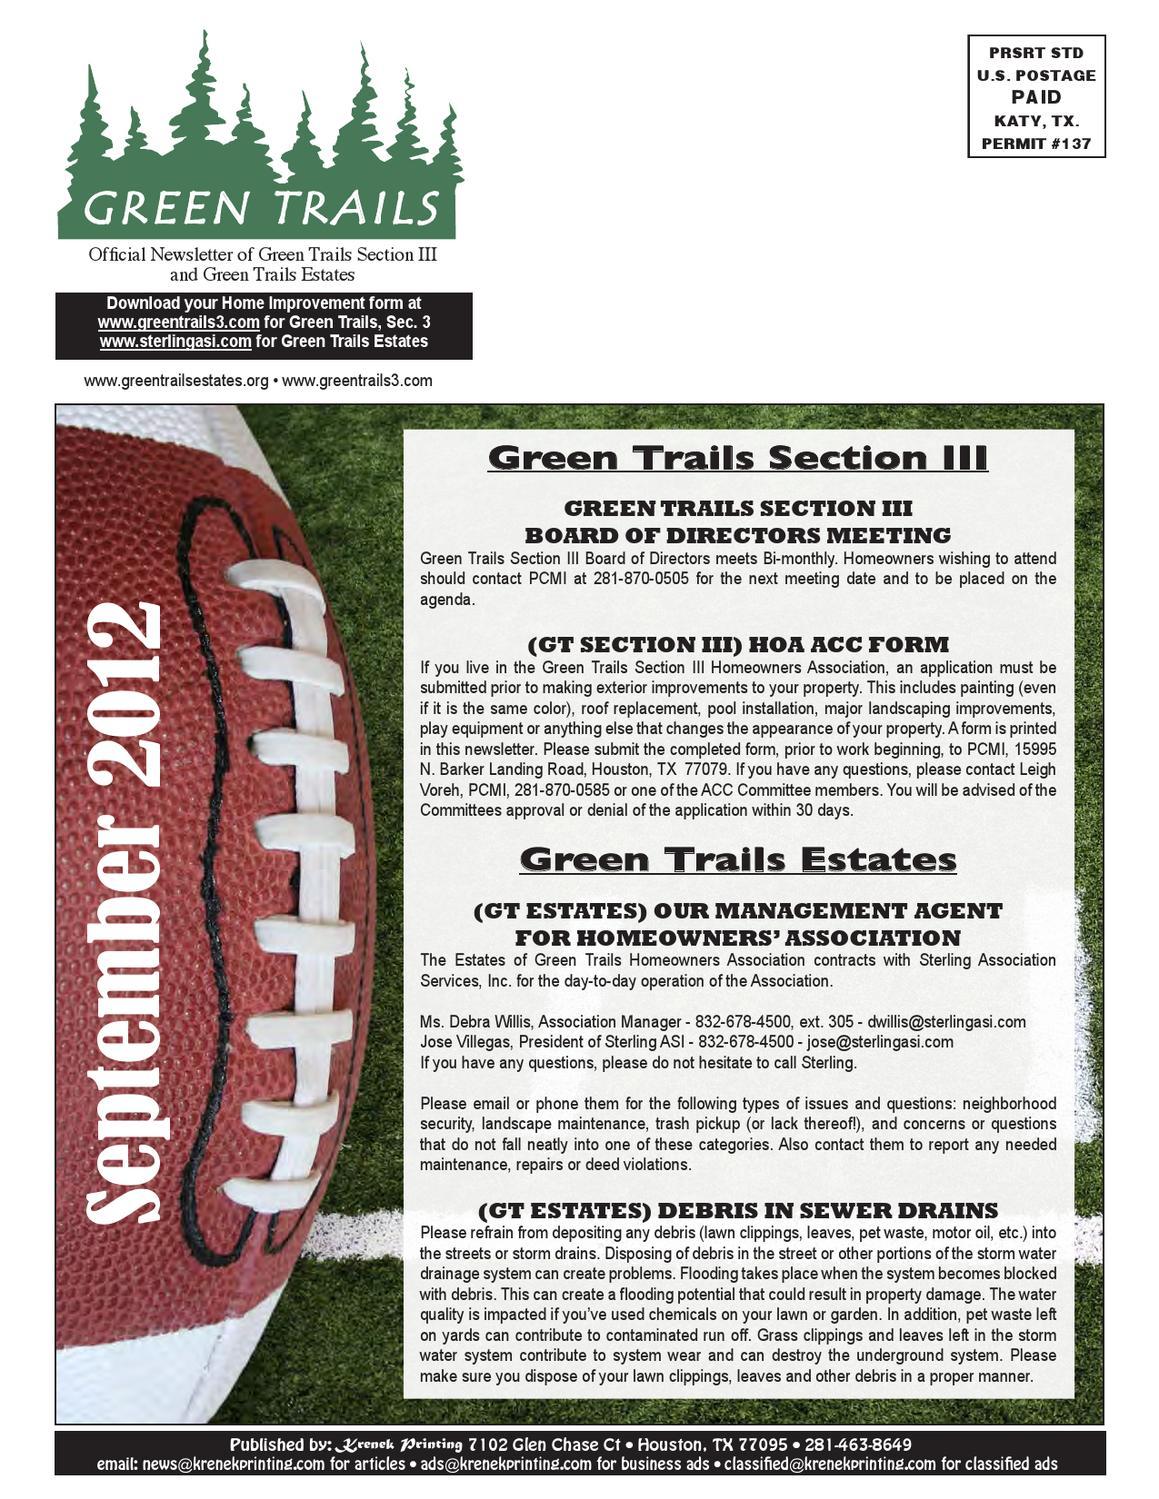 Green_Trails_Estates-Sep12